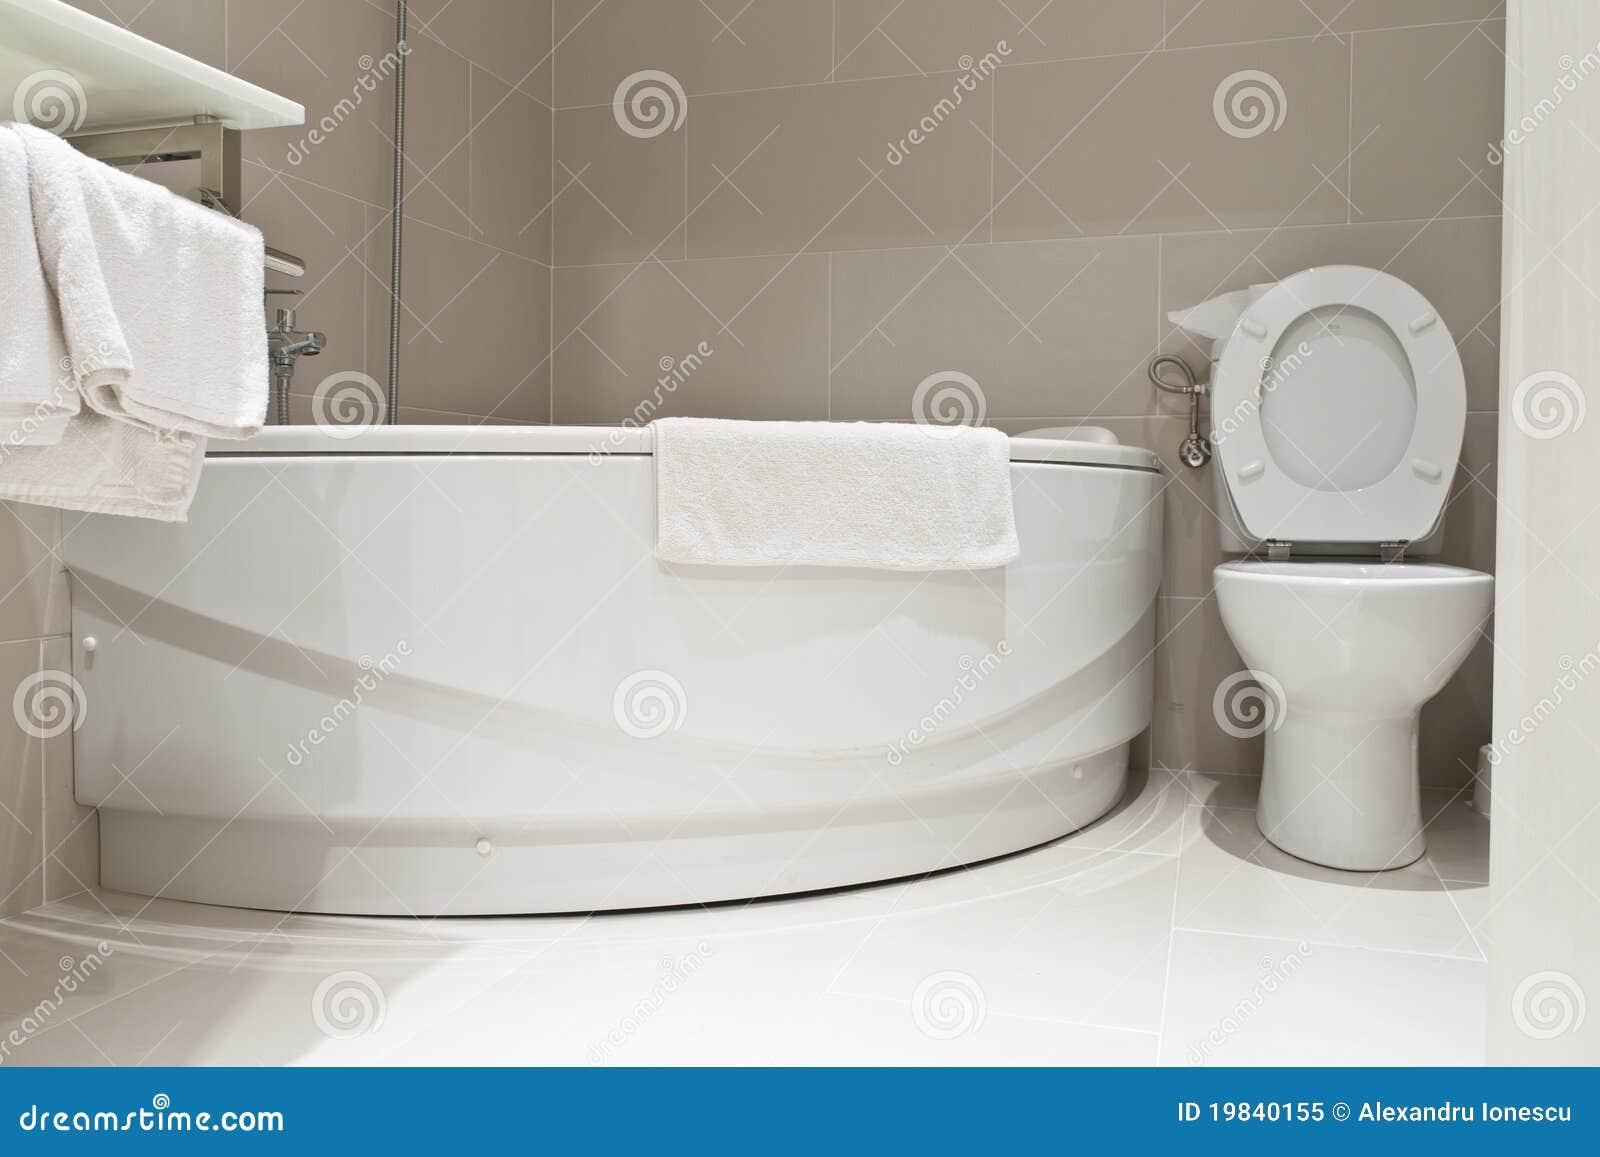 Mini Jacuzzi Bathtub.Small Bathroom Stock Image Image Of Bathroom Watercloset